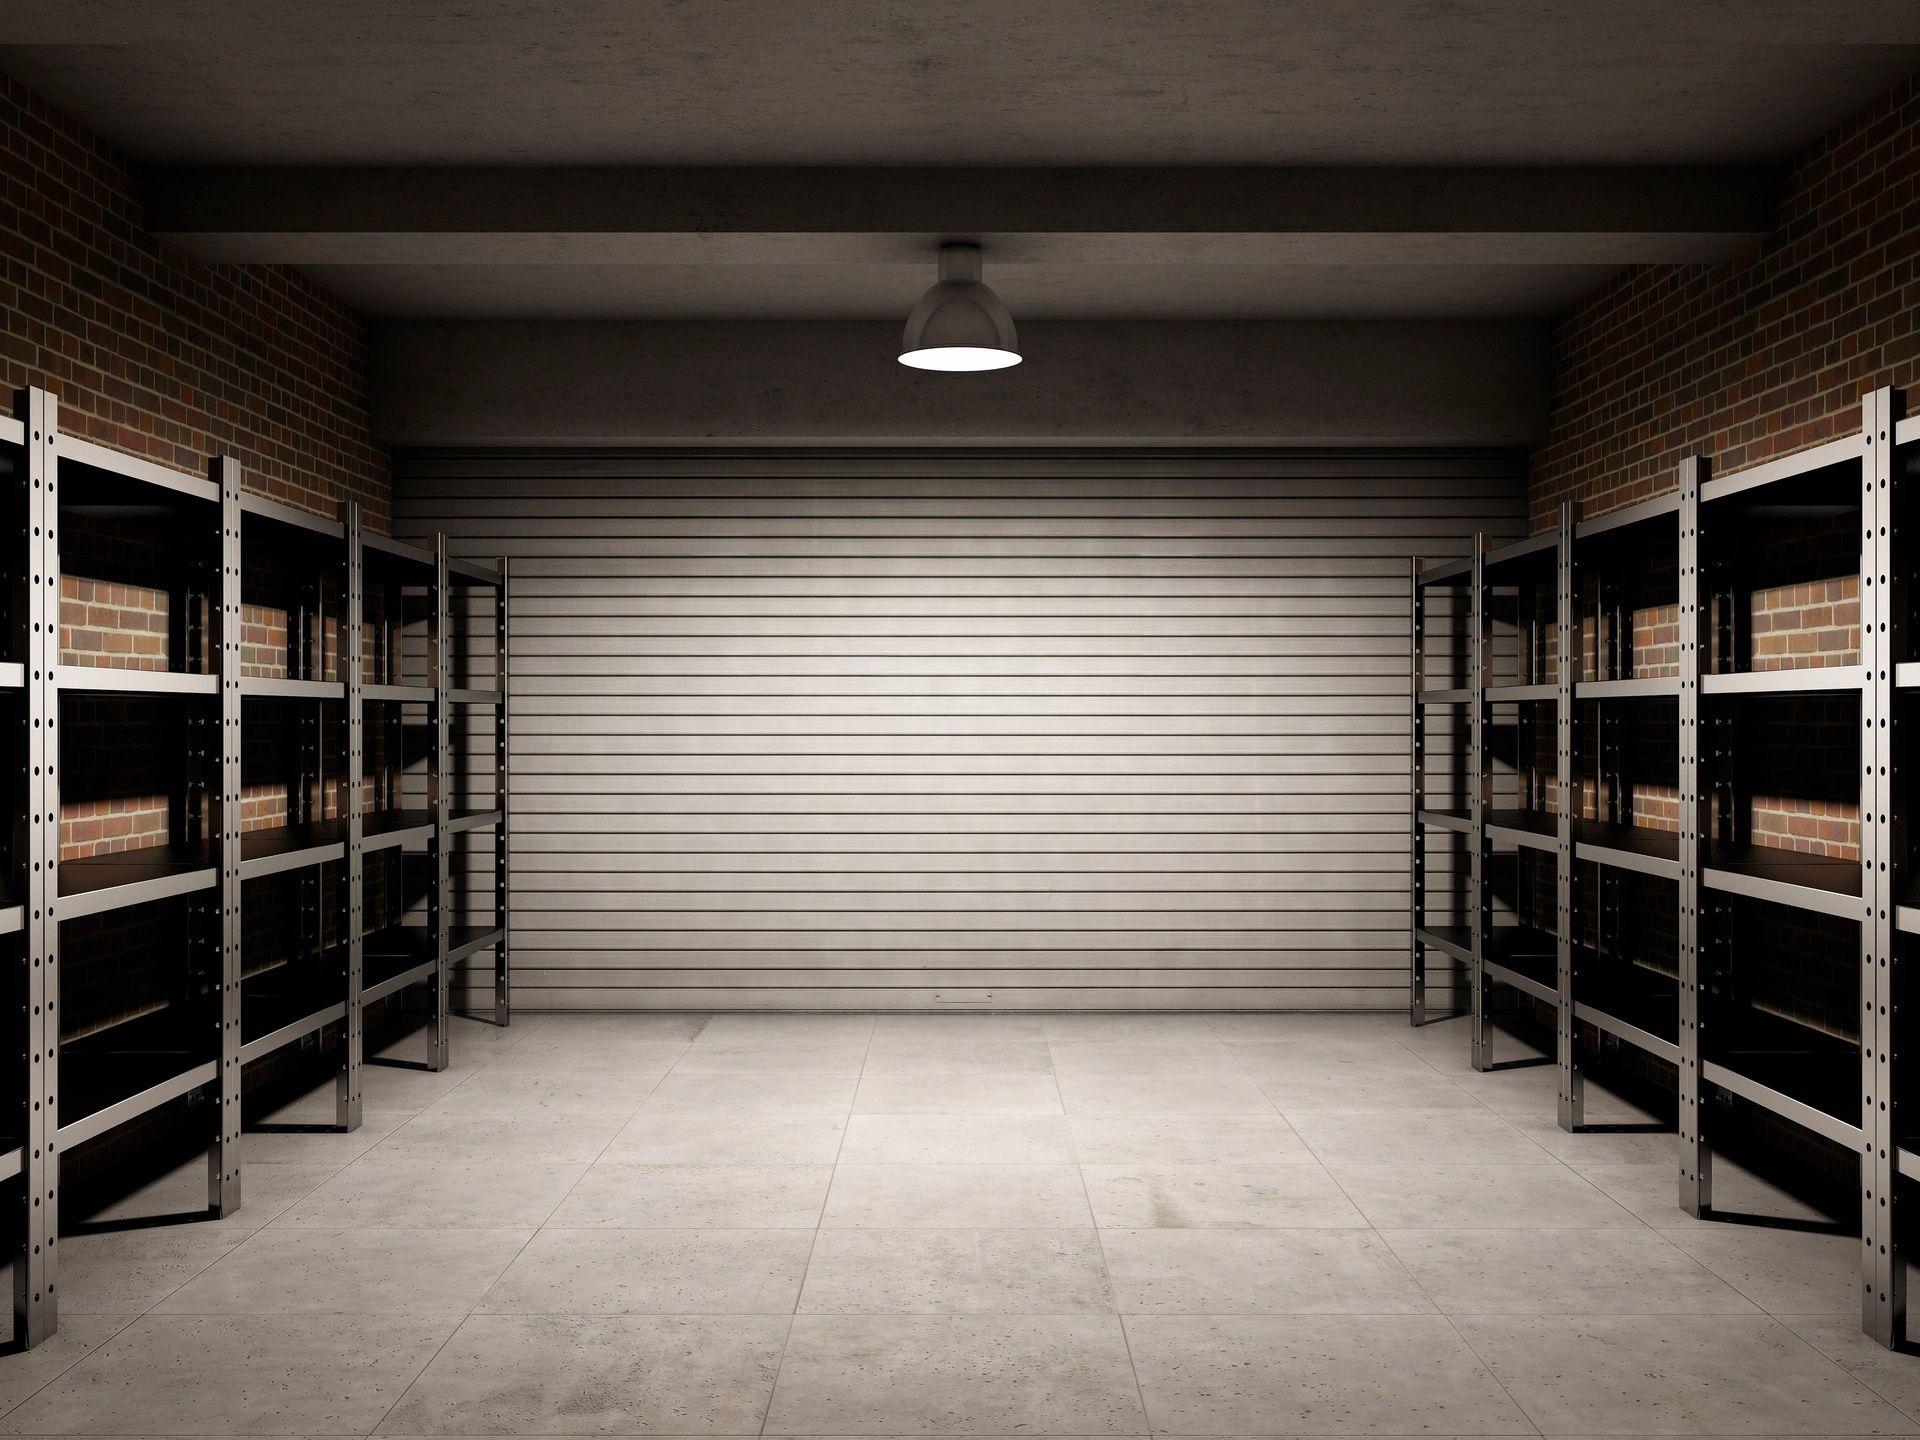 Heavy Duty Roll Up Garage Doors Austin TX